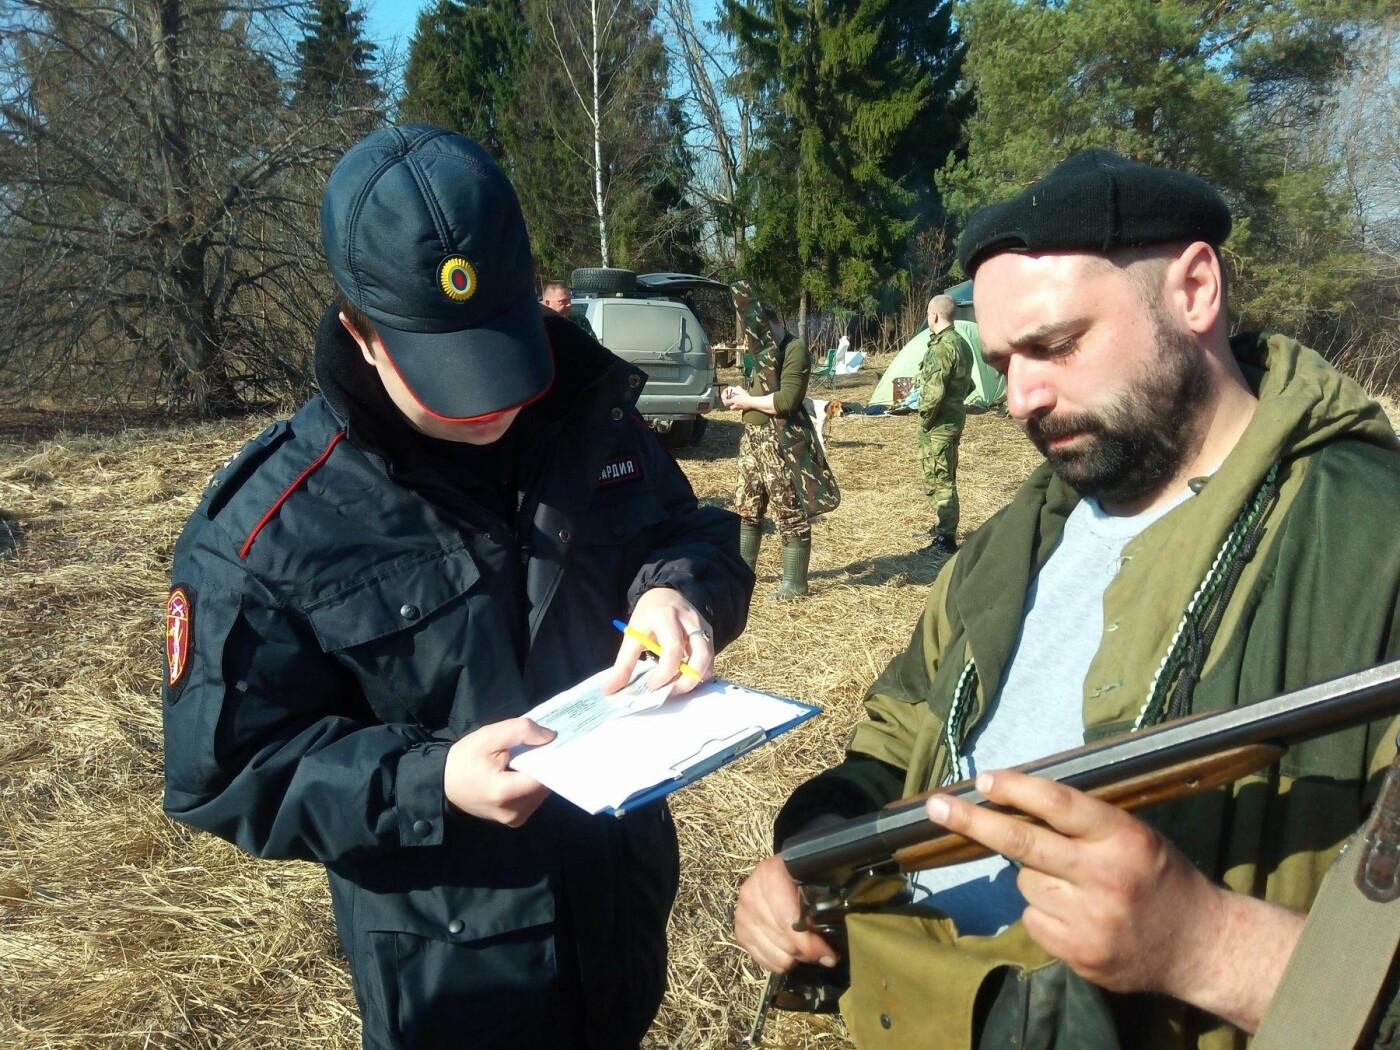 В Псковской области проведено оперативно-профилактическое мероприятие «Охота», фото-1